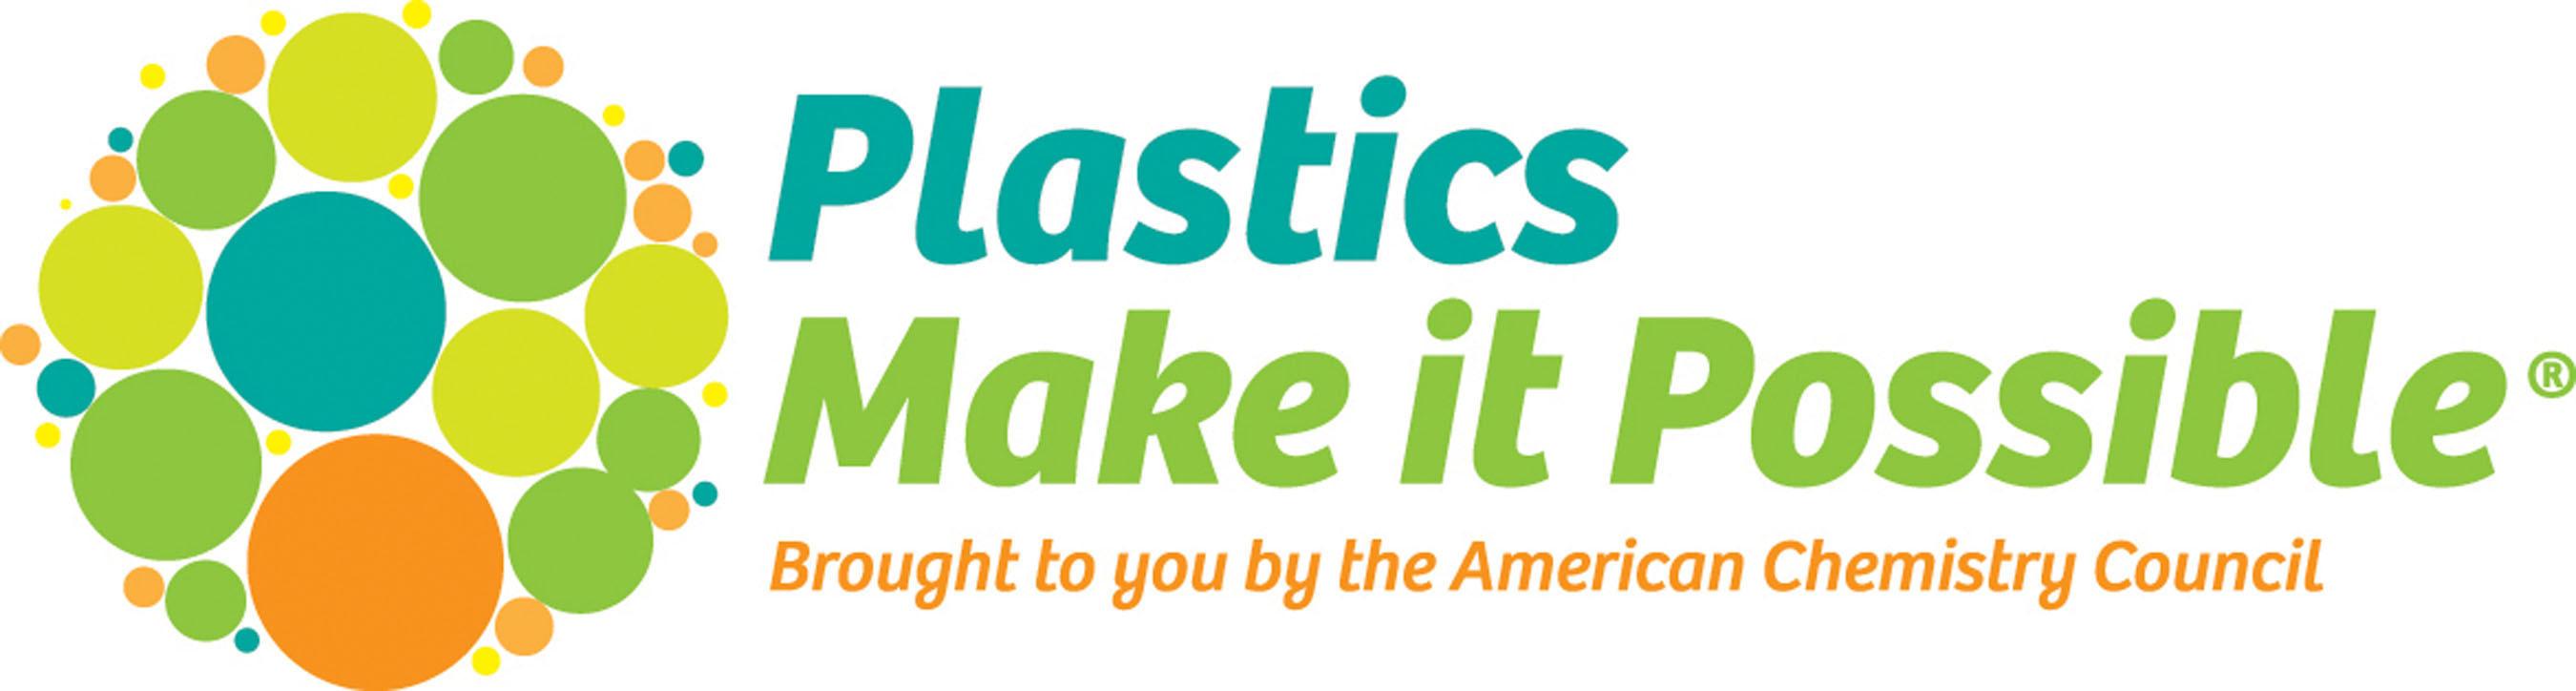 Plastics Make it Possible is an Initiative Sponsored by the Plastics Industries of the American Chemistry Council. (PRNewsFoto/Plastics Make it Possible) (PRNewsFoto/Plastics Make it Possible)